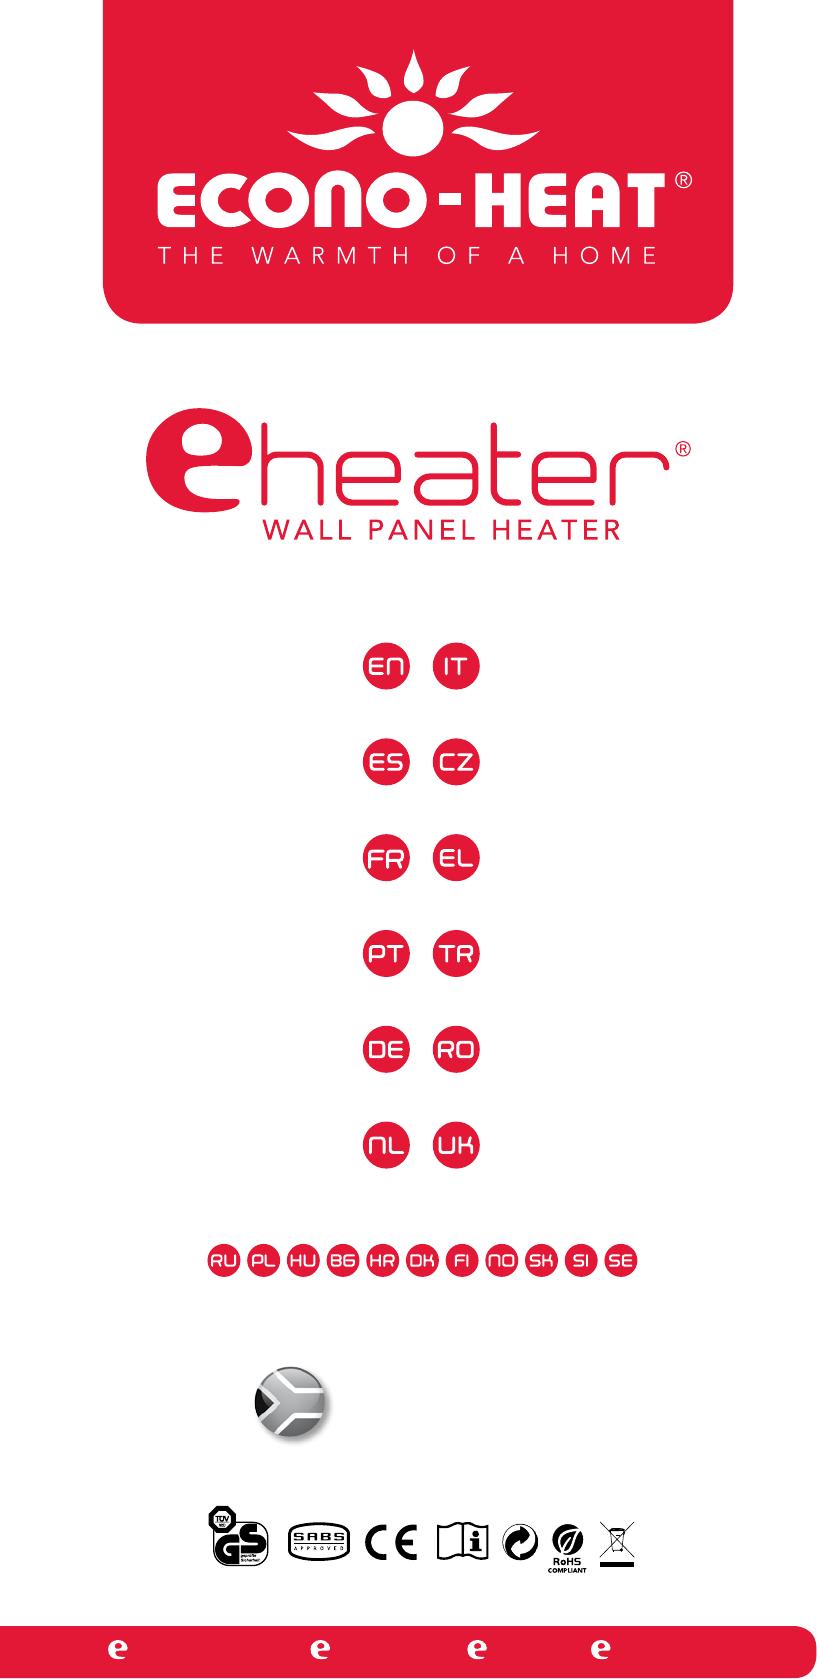 econo heat eheater 0607 instruction manual